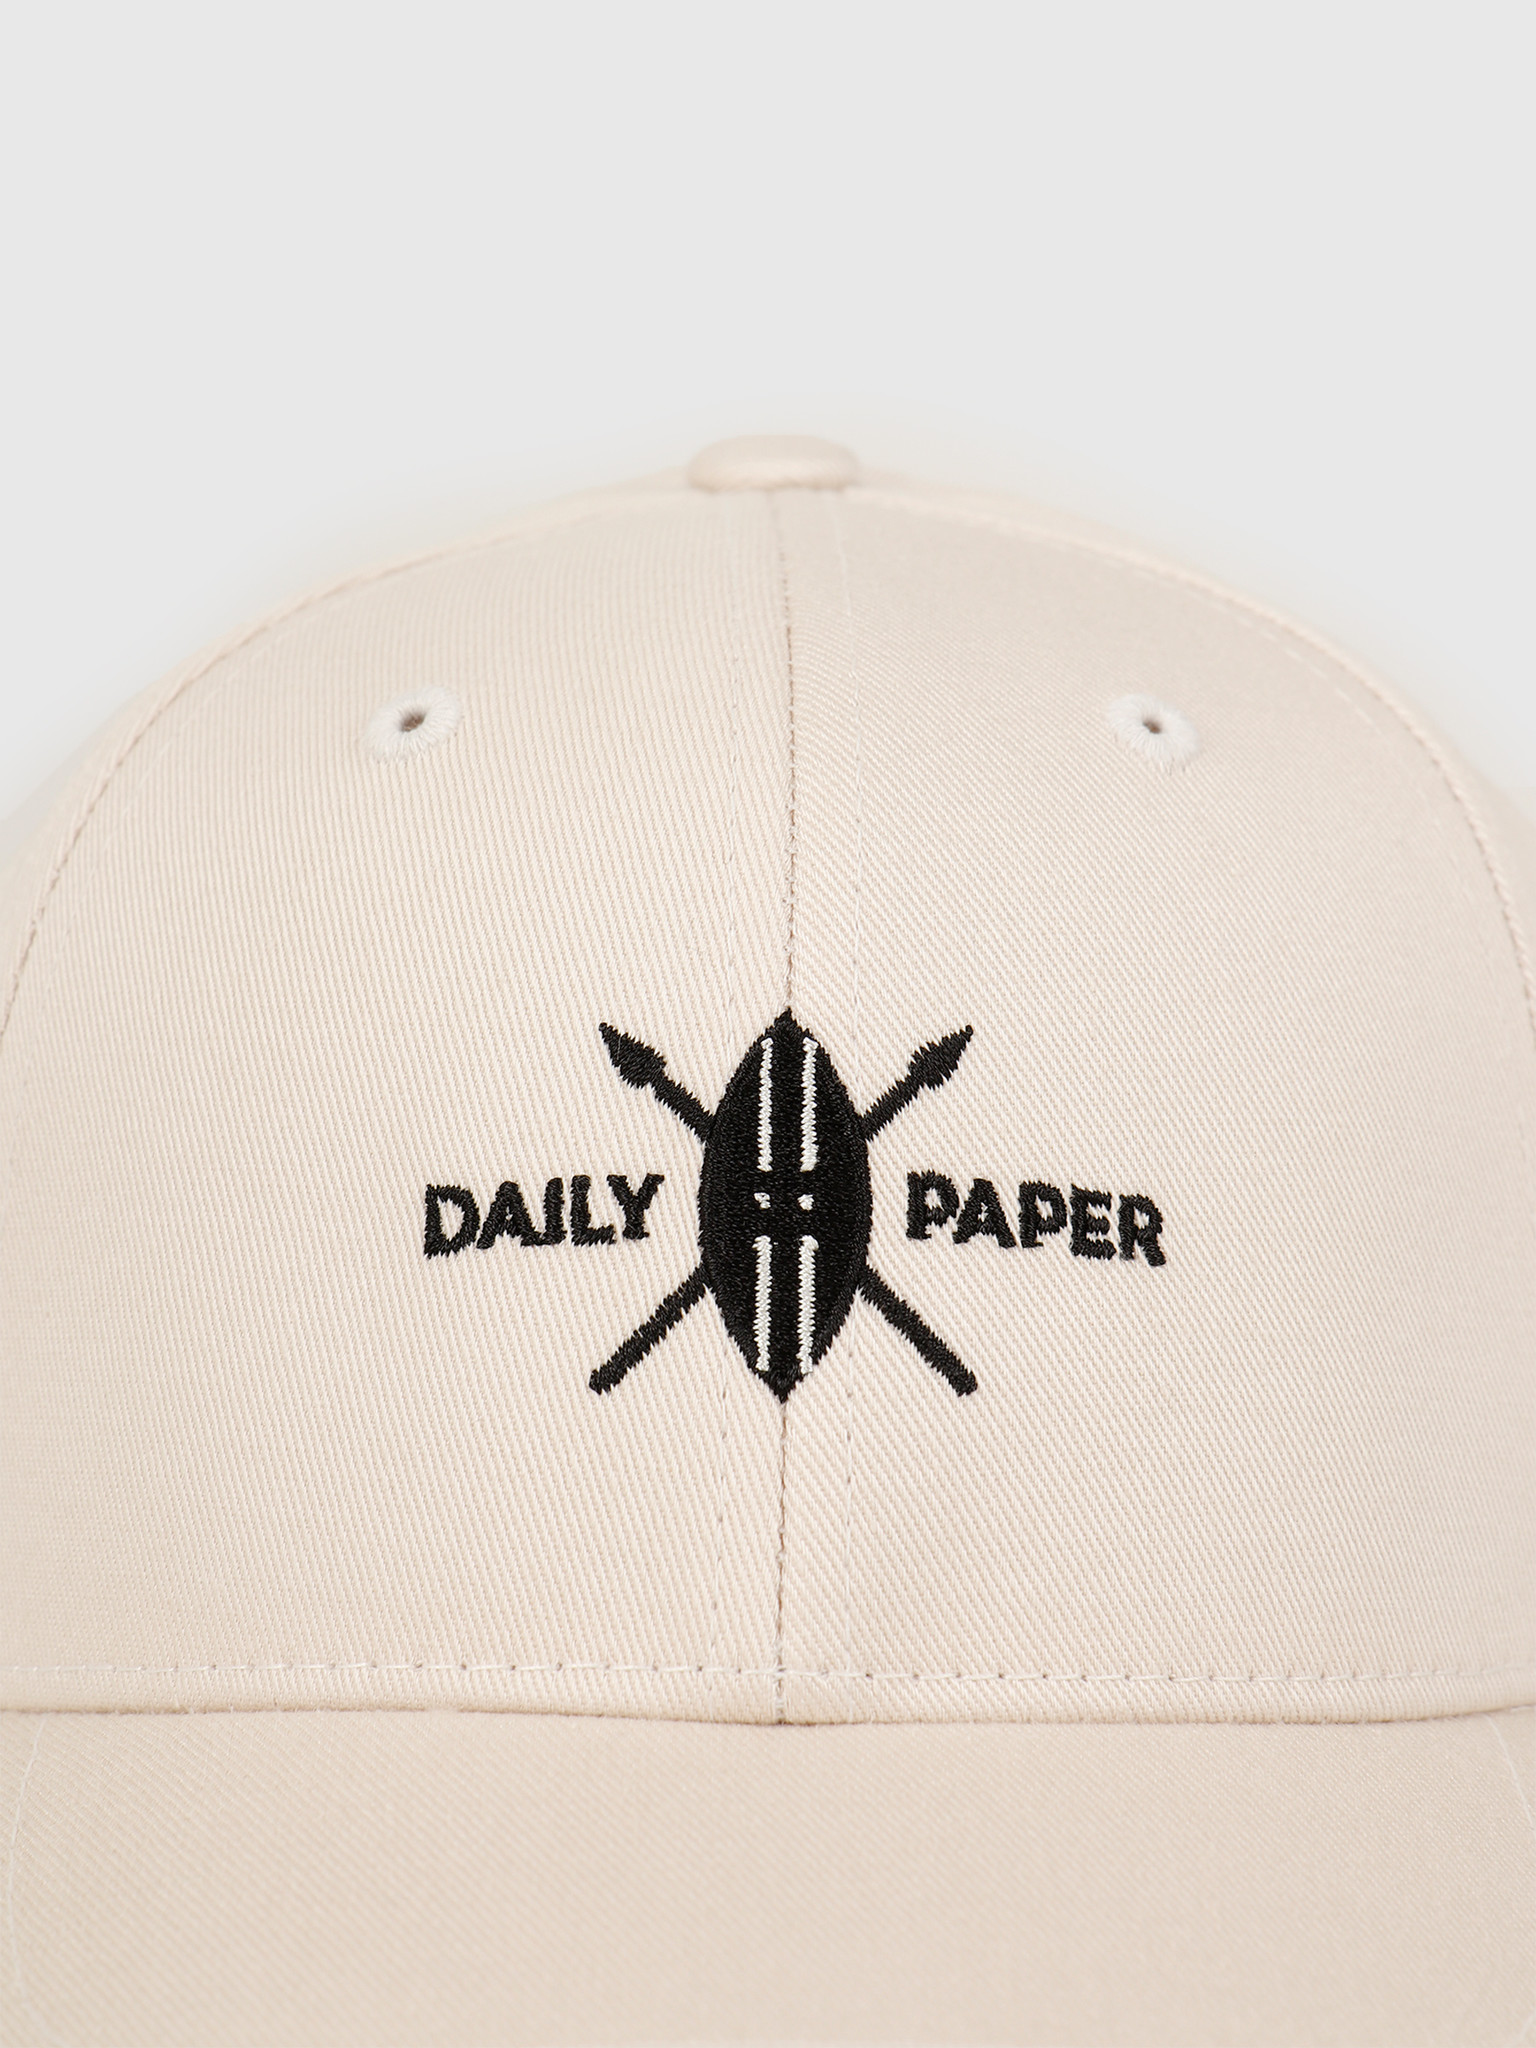 Daily Paper Daily Paper Shield Logo Cap Moonbeam Beige 20E1AC05-01